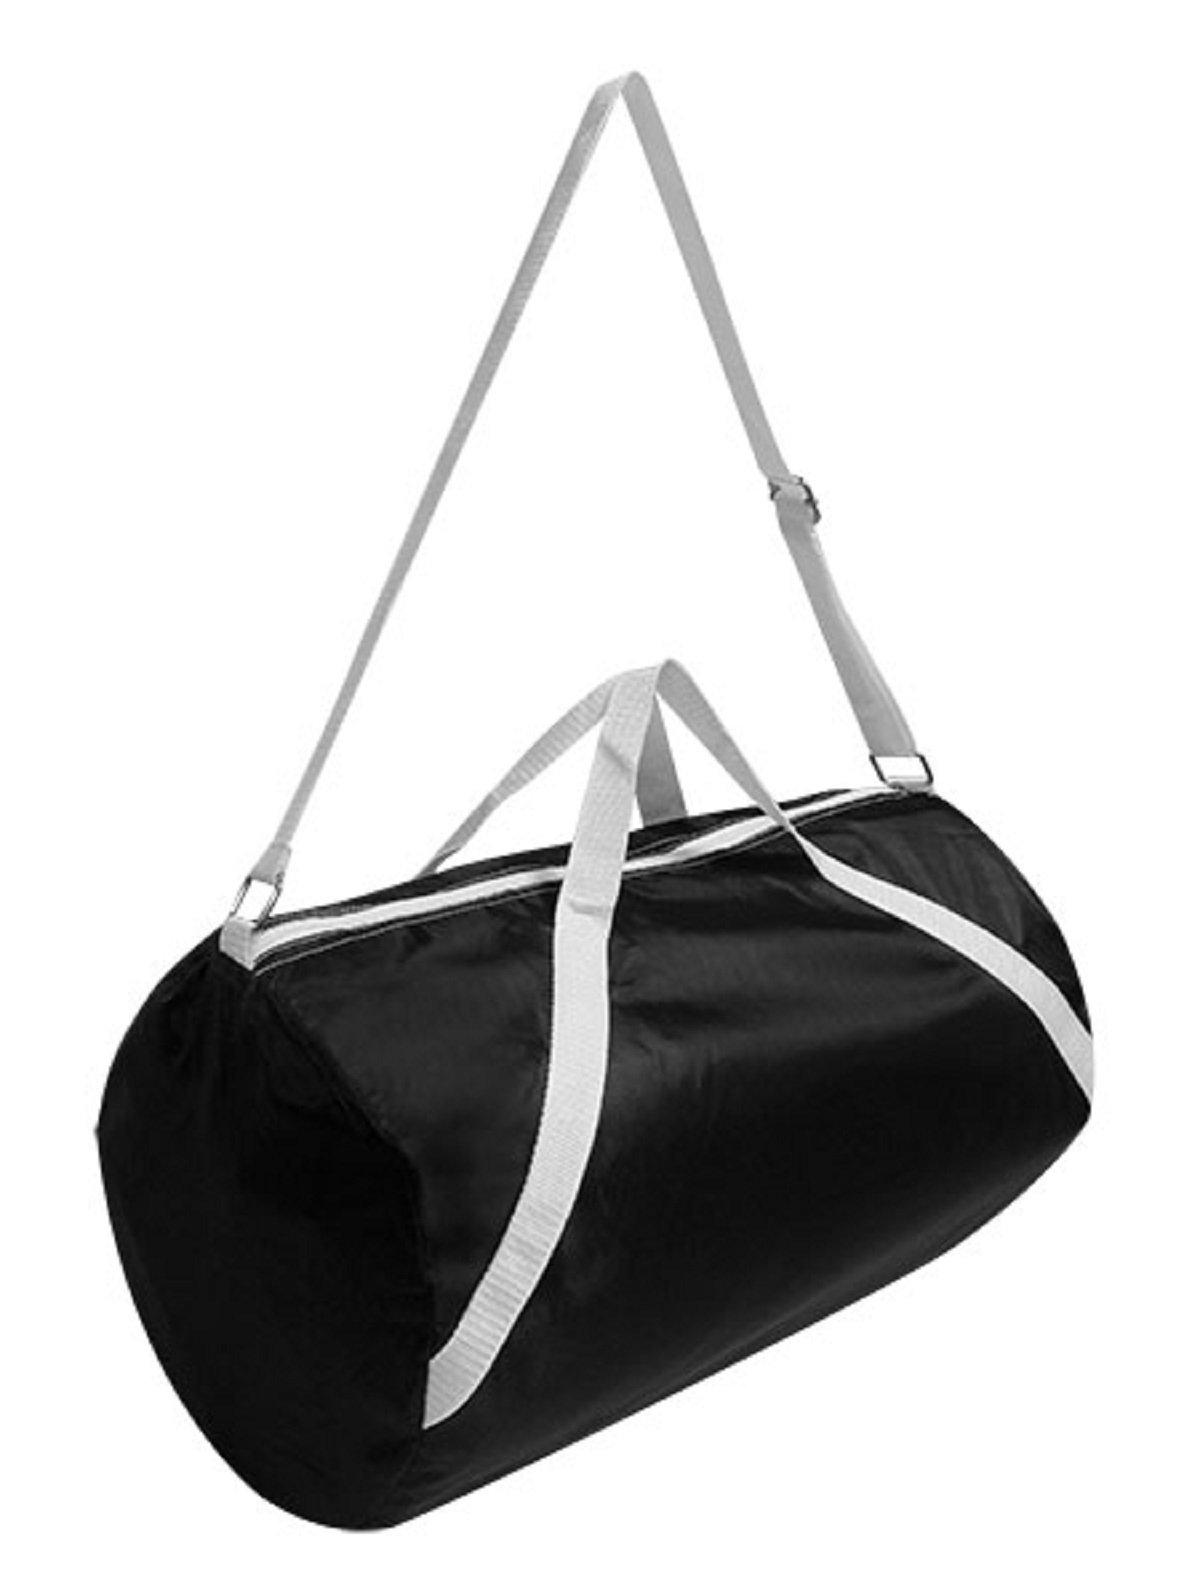 NYLON SPORT ROLL BAG, Black, Case of 48 by DollarItemDirect